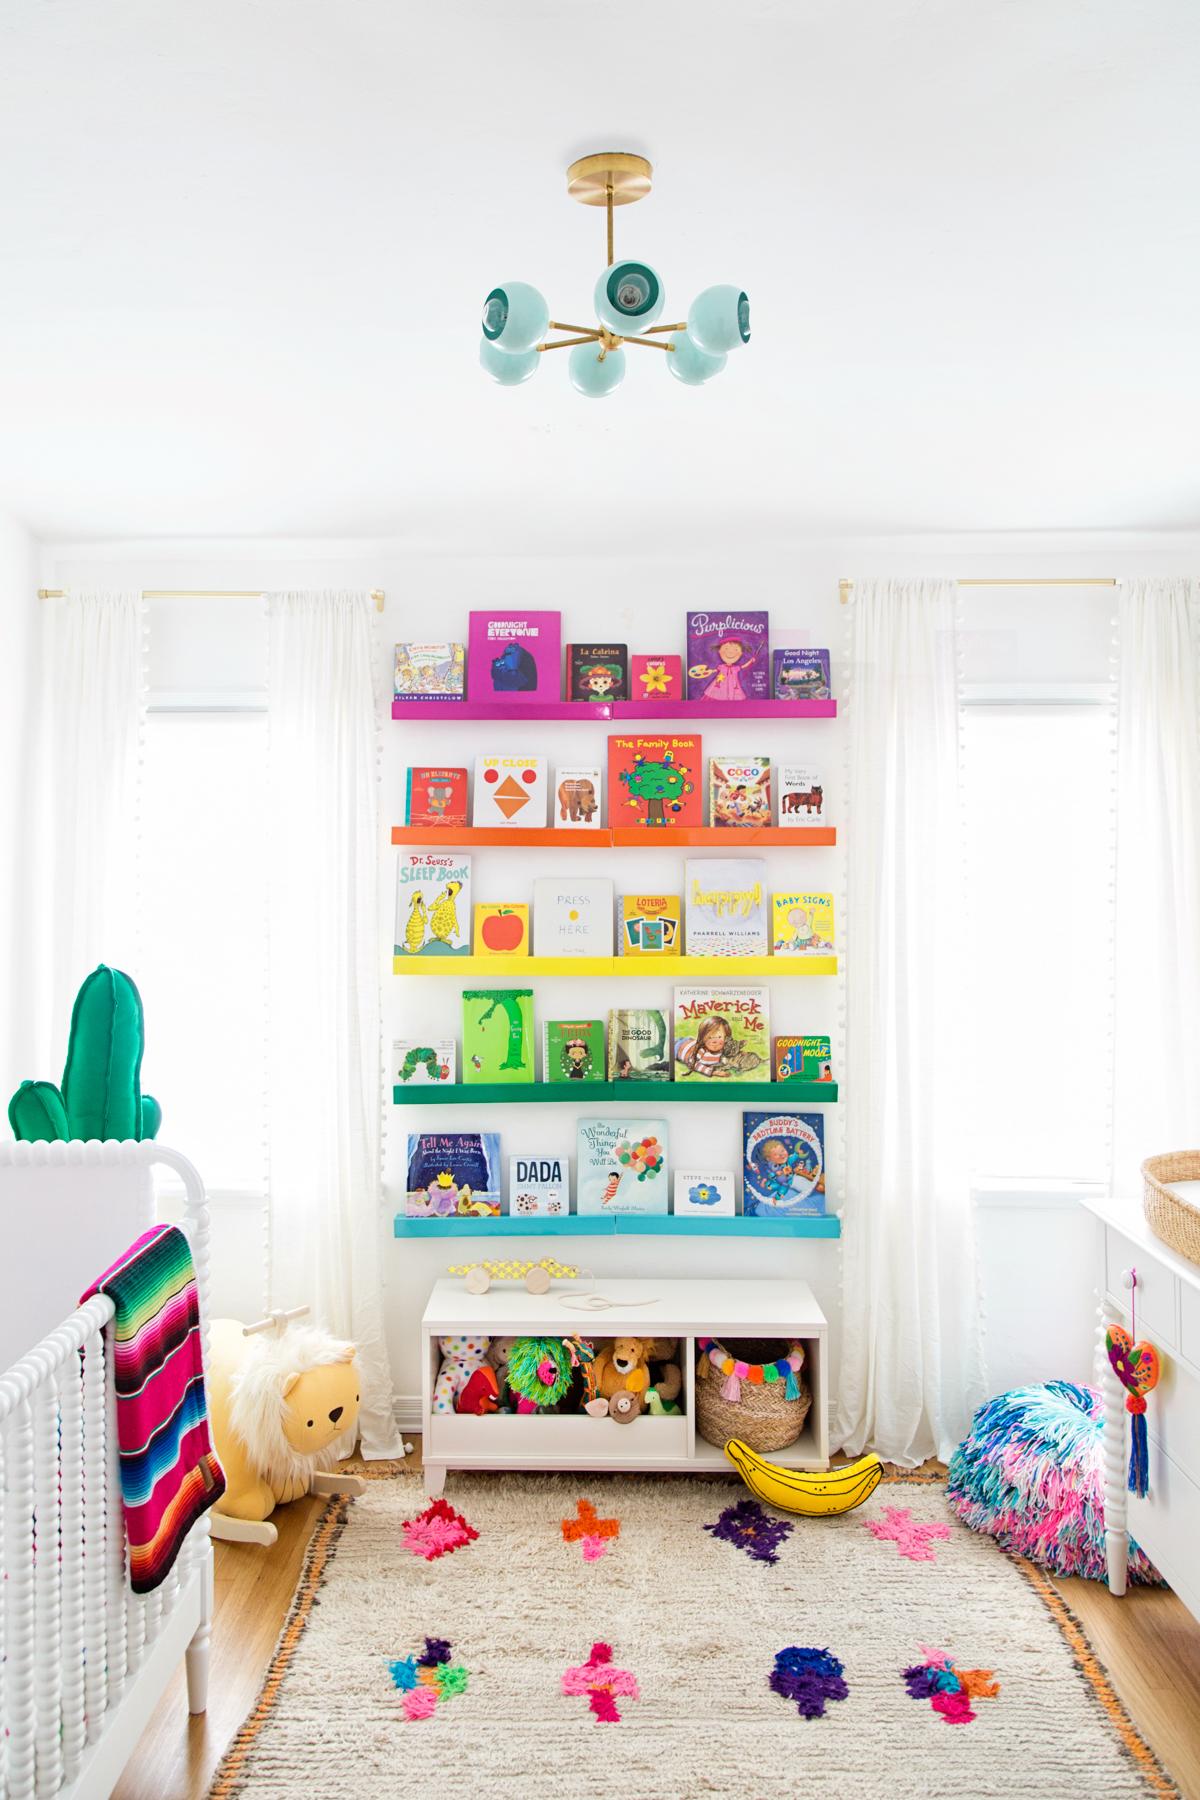 Nursery design from Studio DIY